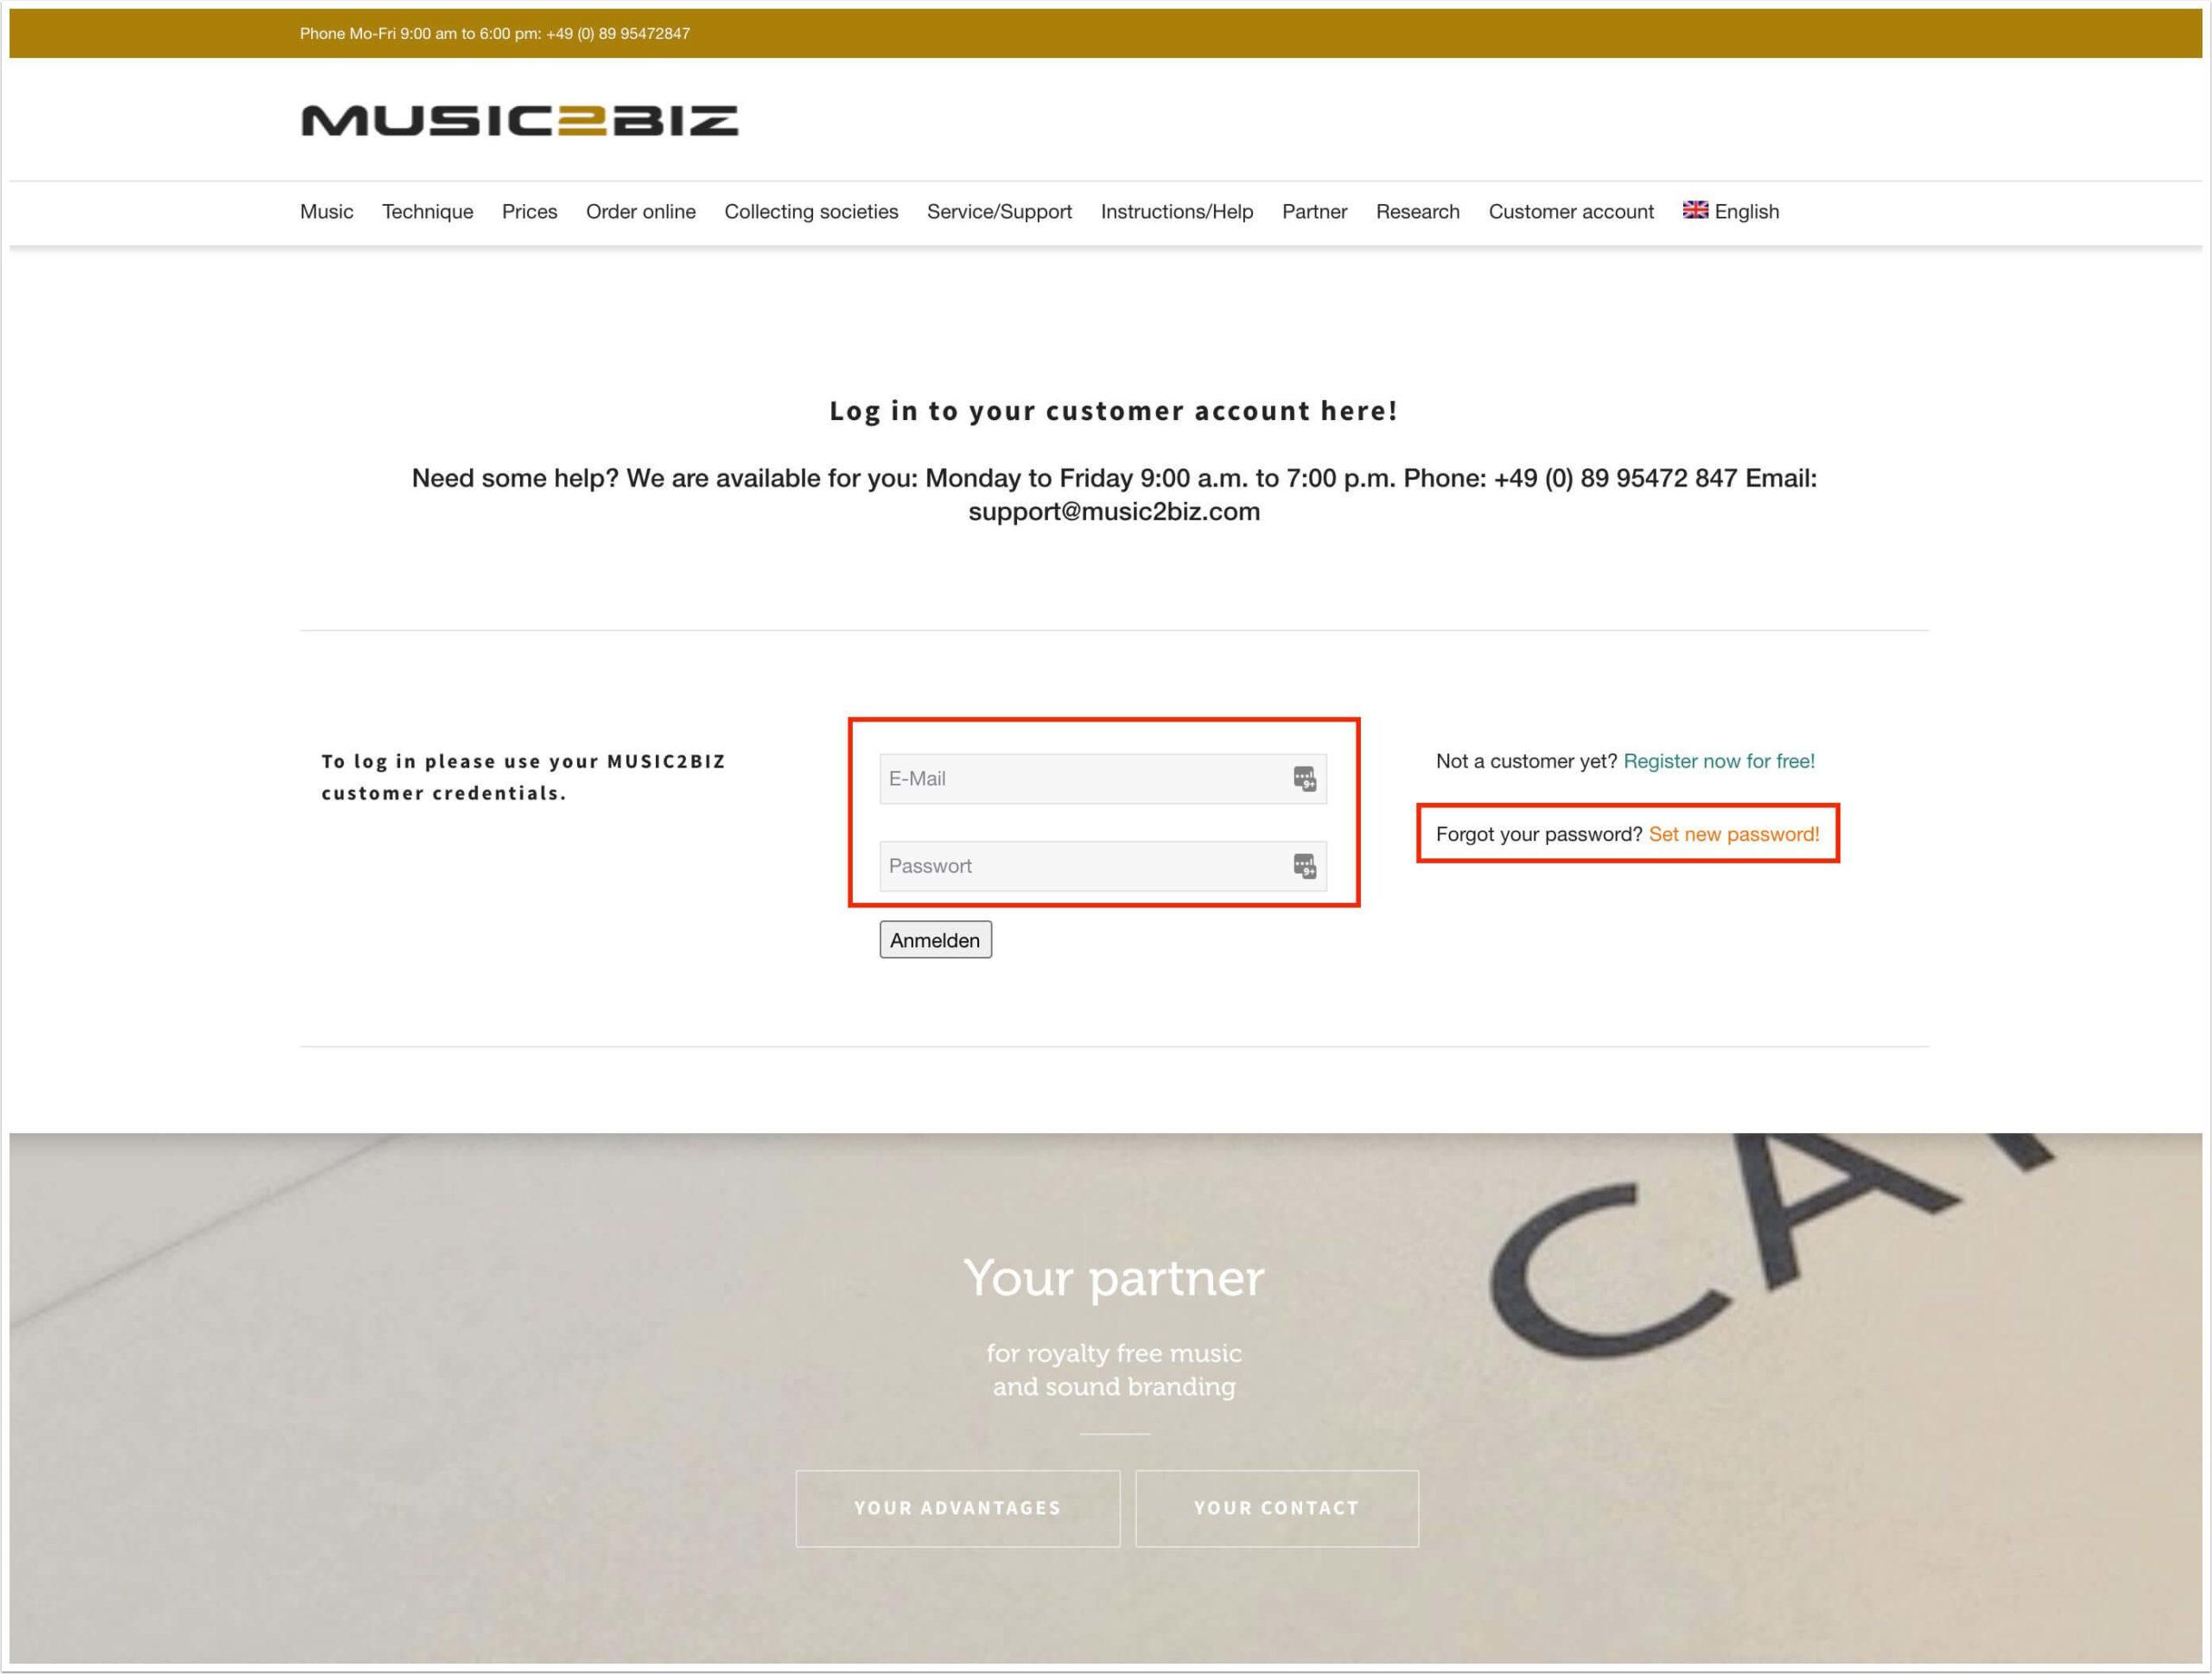 the registration form on the music2biz website